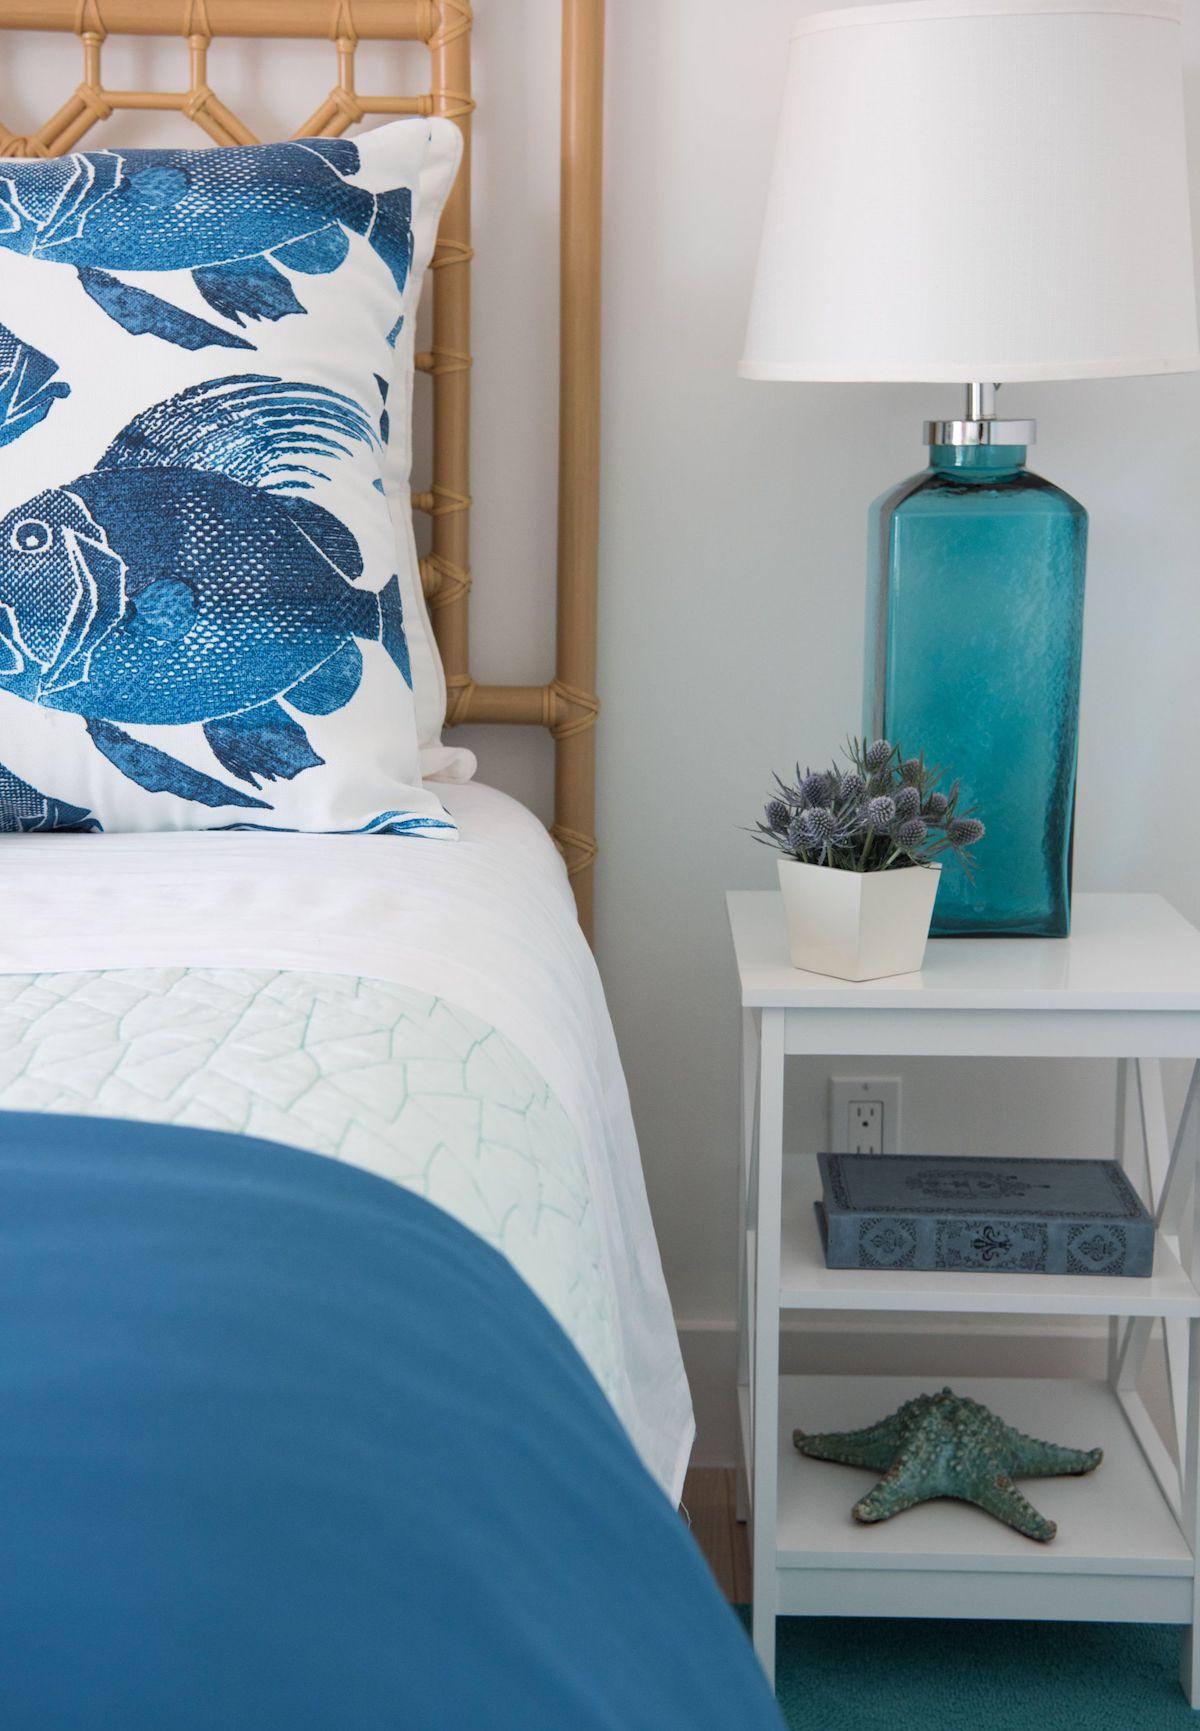 Coastal turquoise glass table lamp via Beth Lindsey